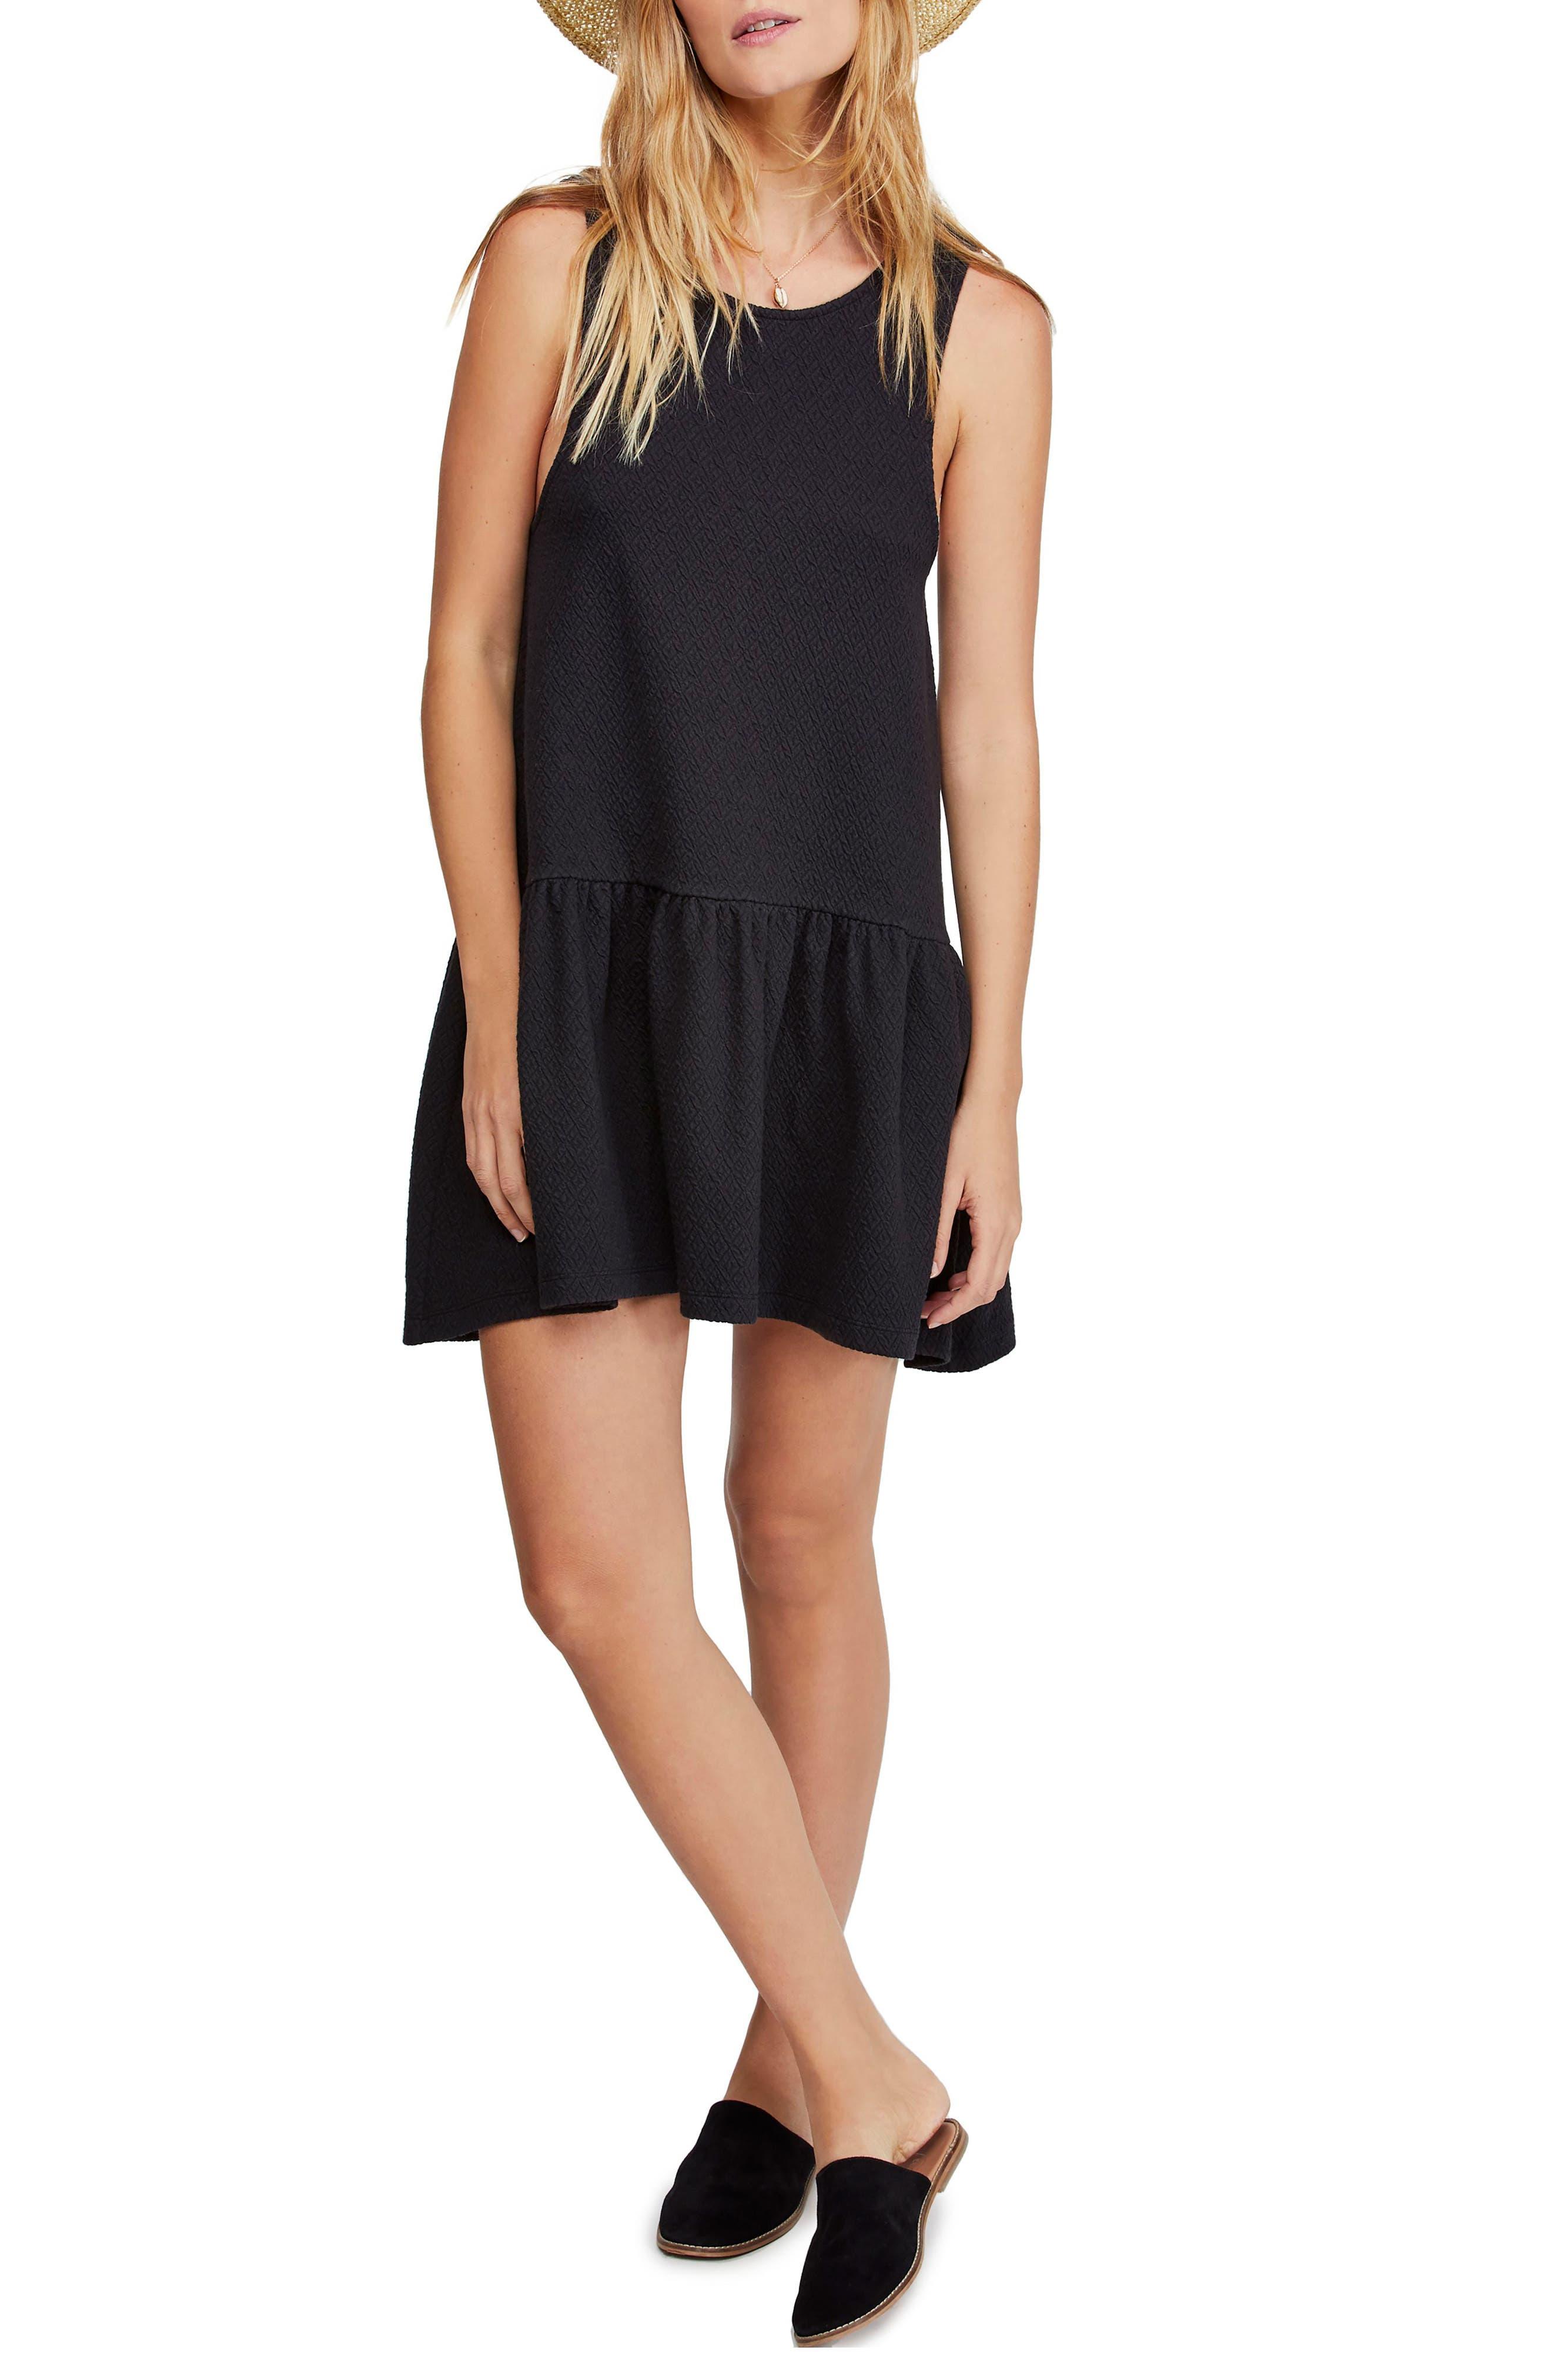 Free People Easy Street Sleeveless Minidress, Black